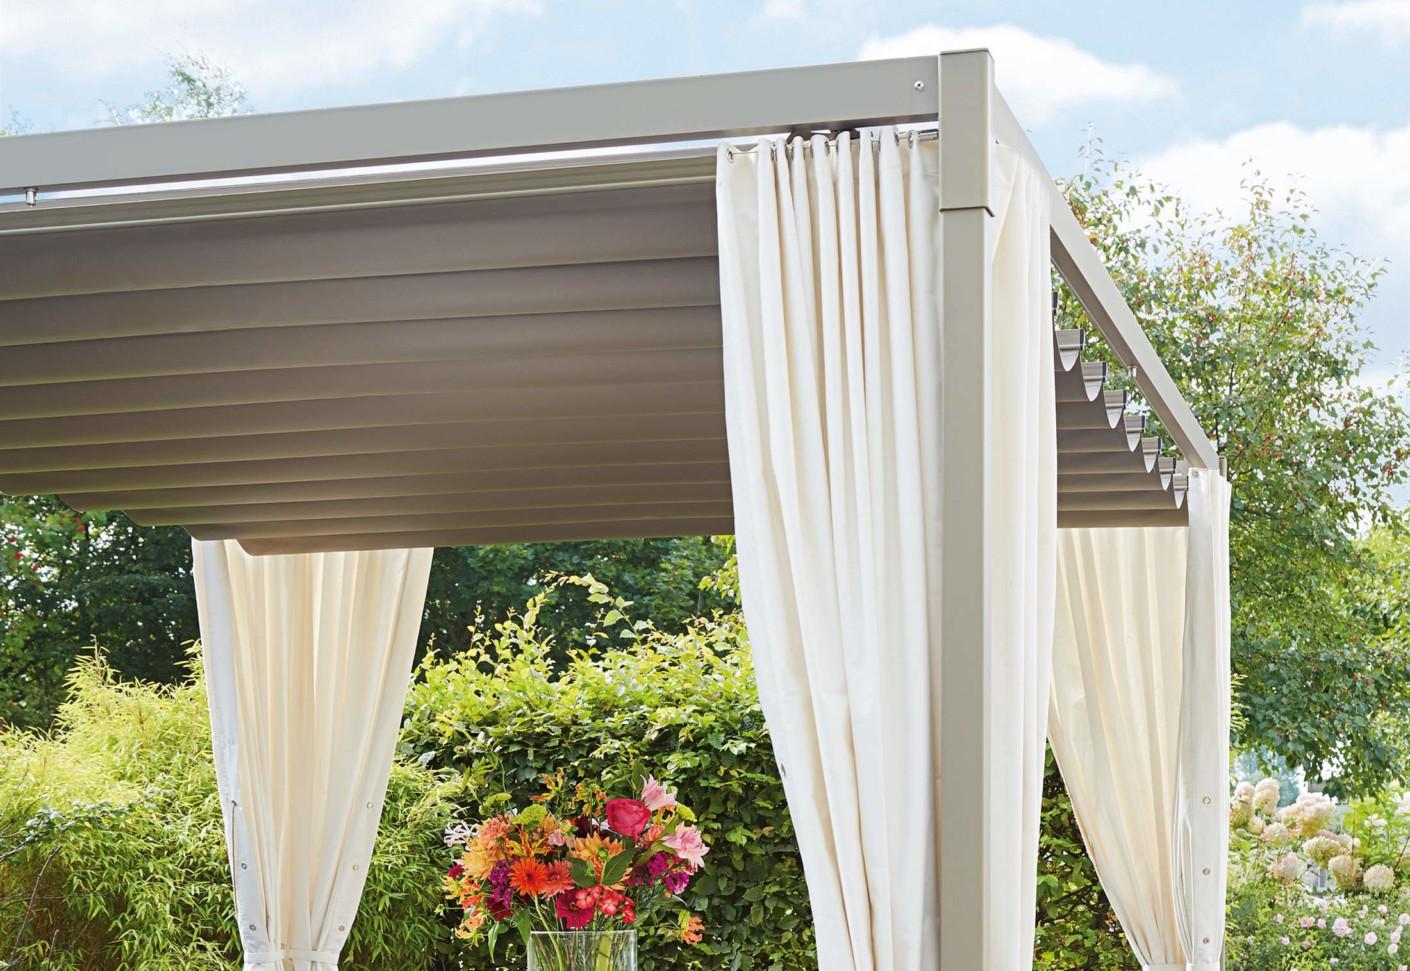 pavillon mit faltdach sonnenschutz pavillon mit faltdach cc04 hitoiro genial stabiler pavillon. Black Bedroom Furniture Sets. Home Design Ideas